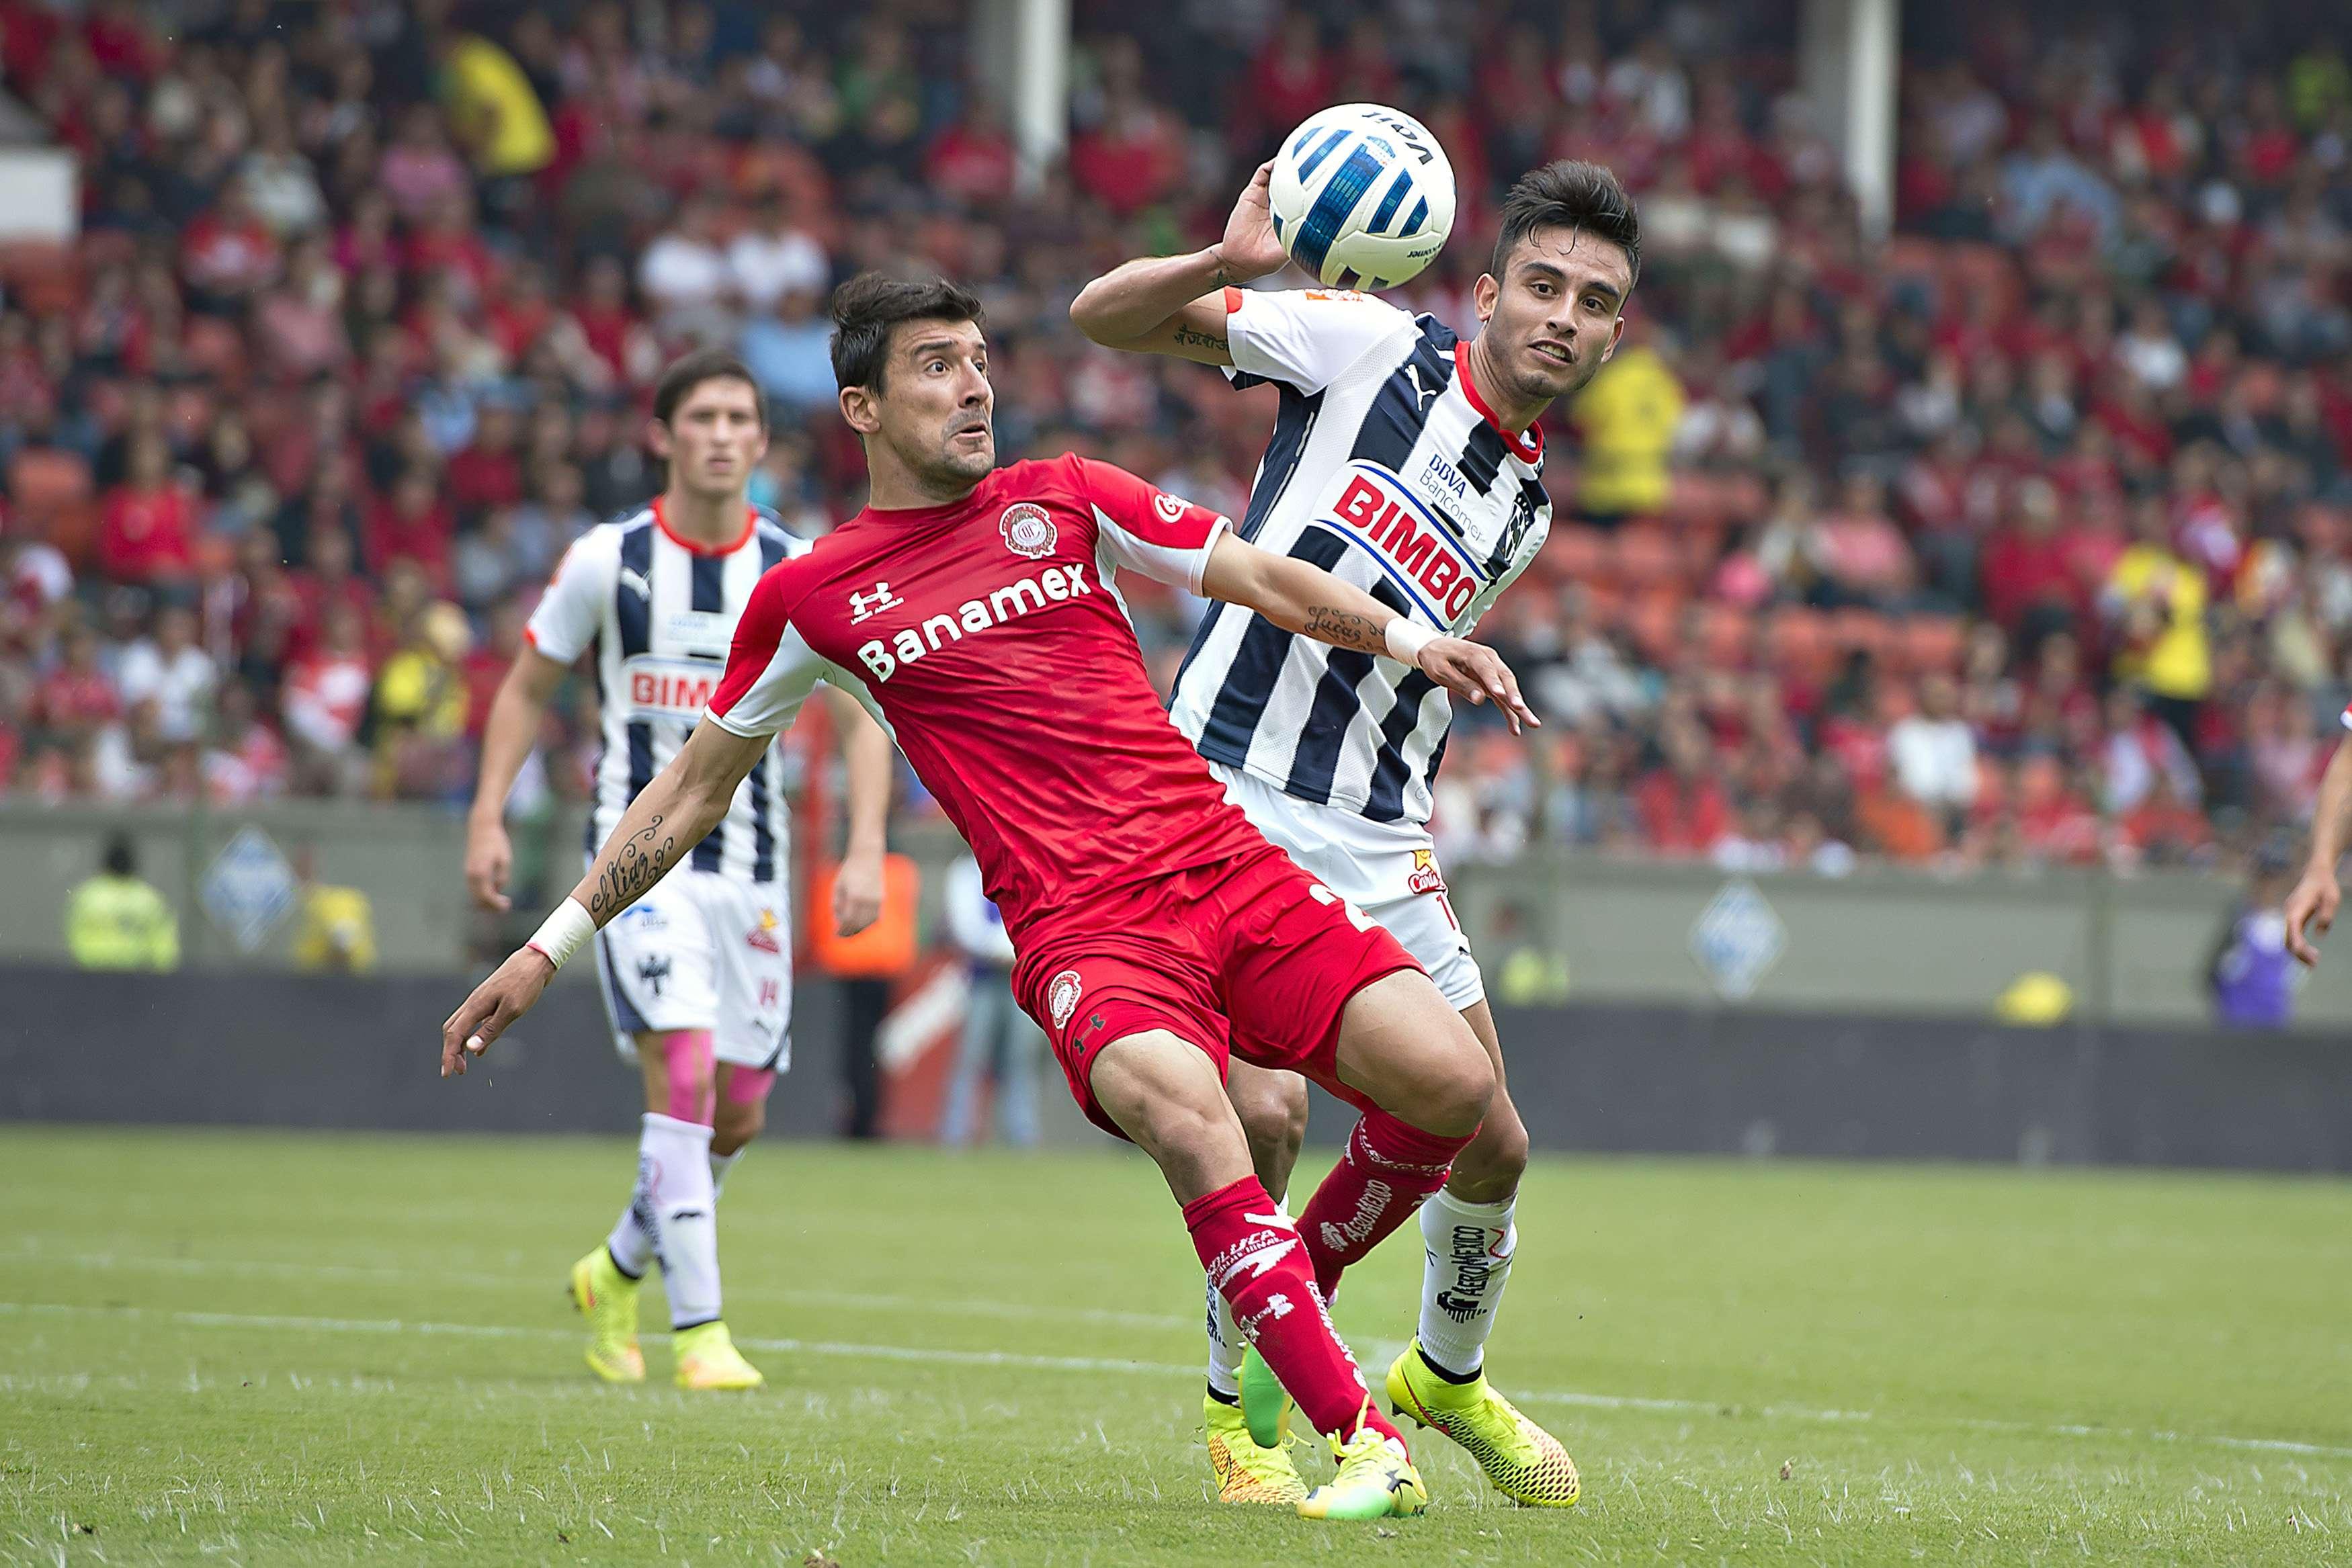 Monterrey buscará cortar la mala racha ante Toluca. Foto: Mexsport